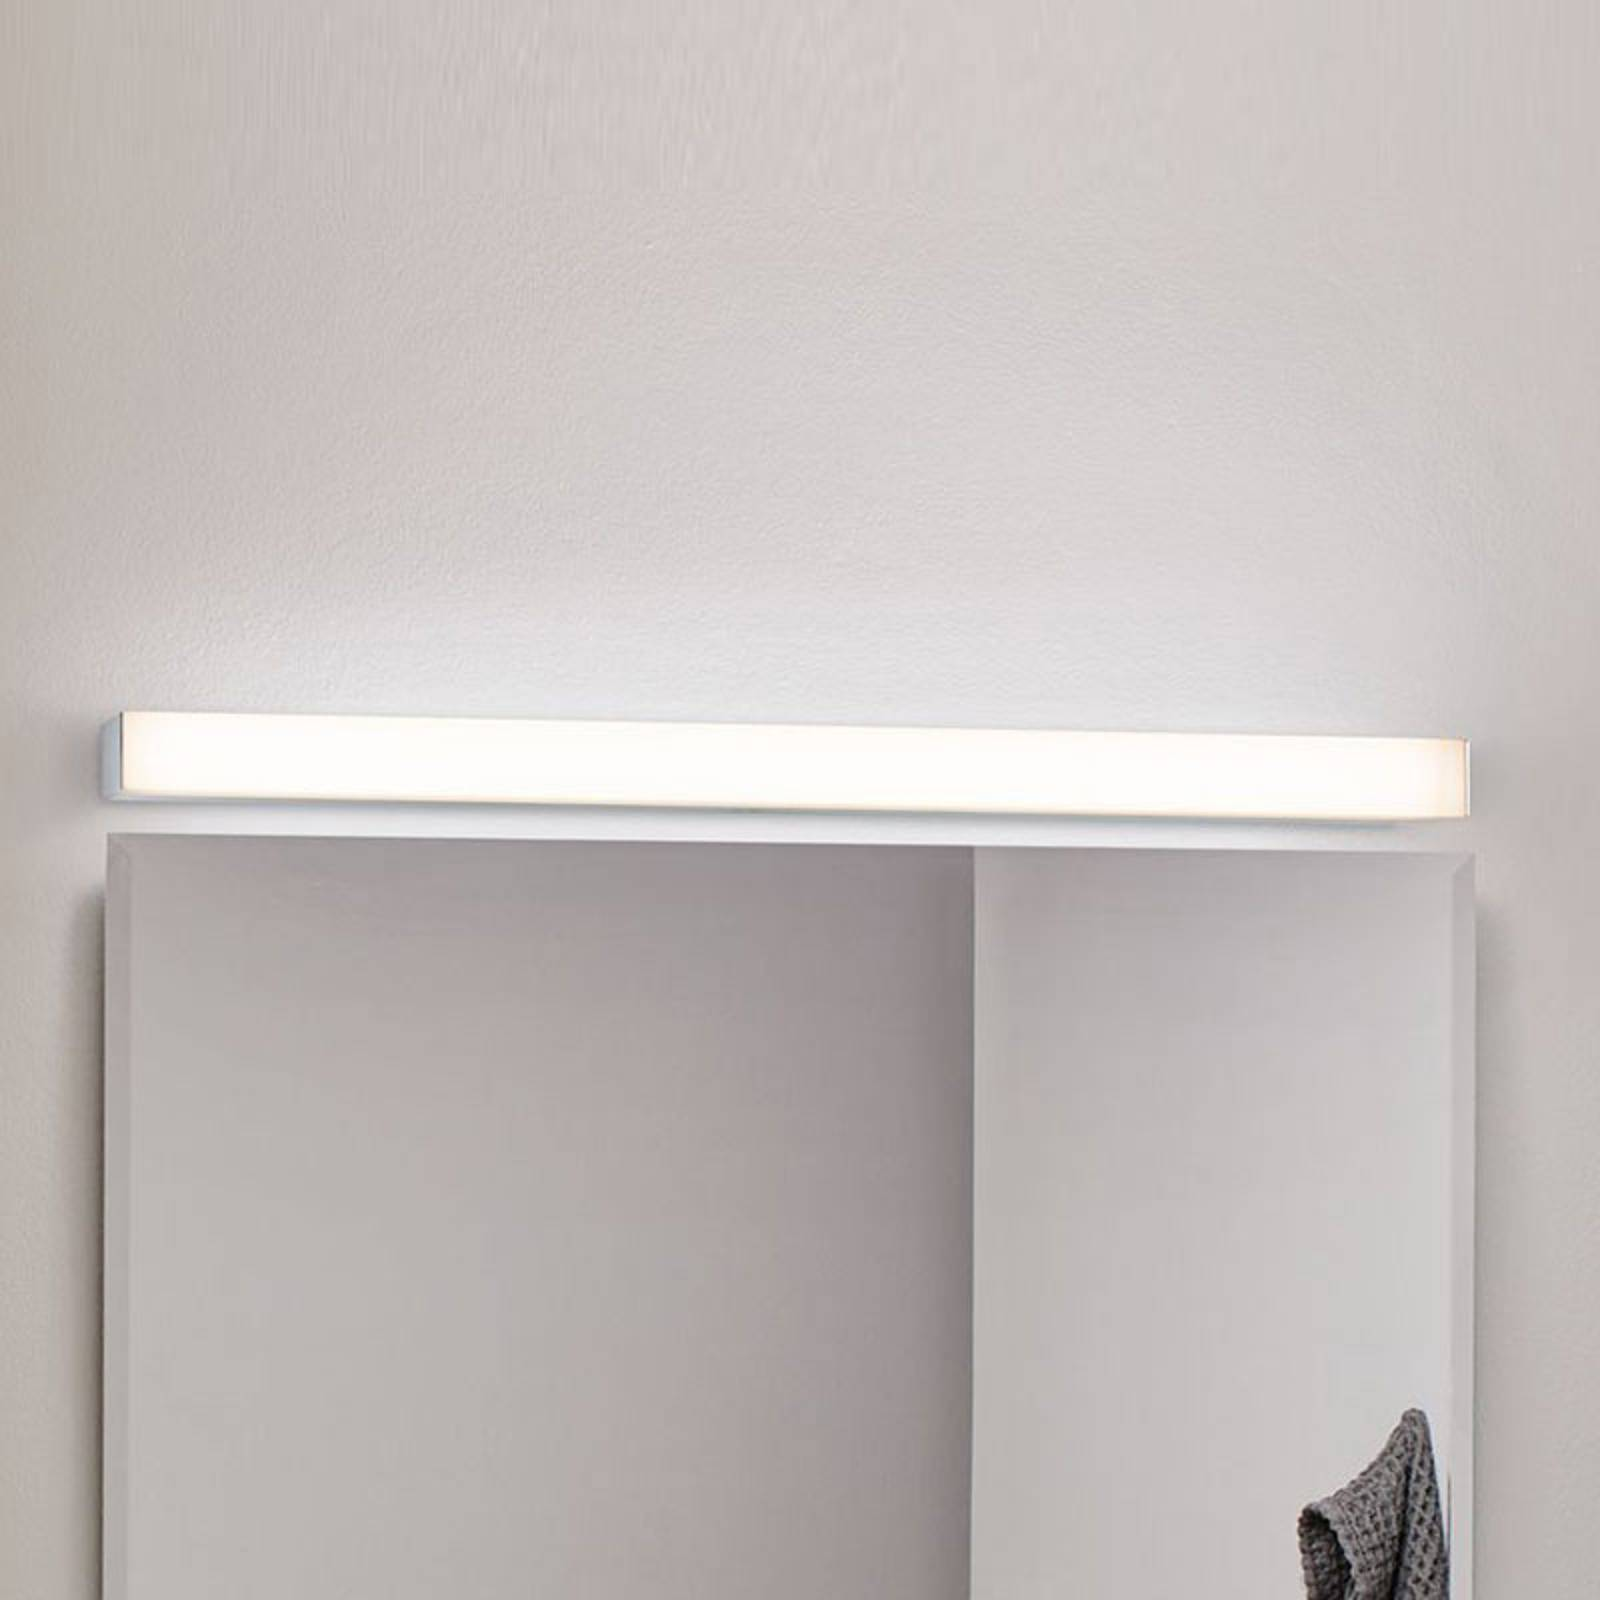 Paulmann HomeSpa Tova -LED-peililamppu, 60 cm